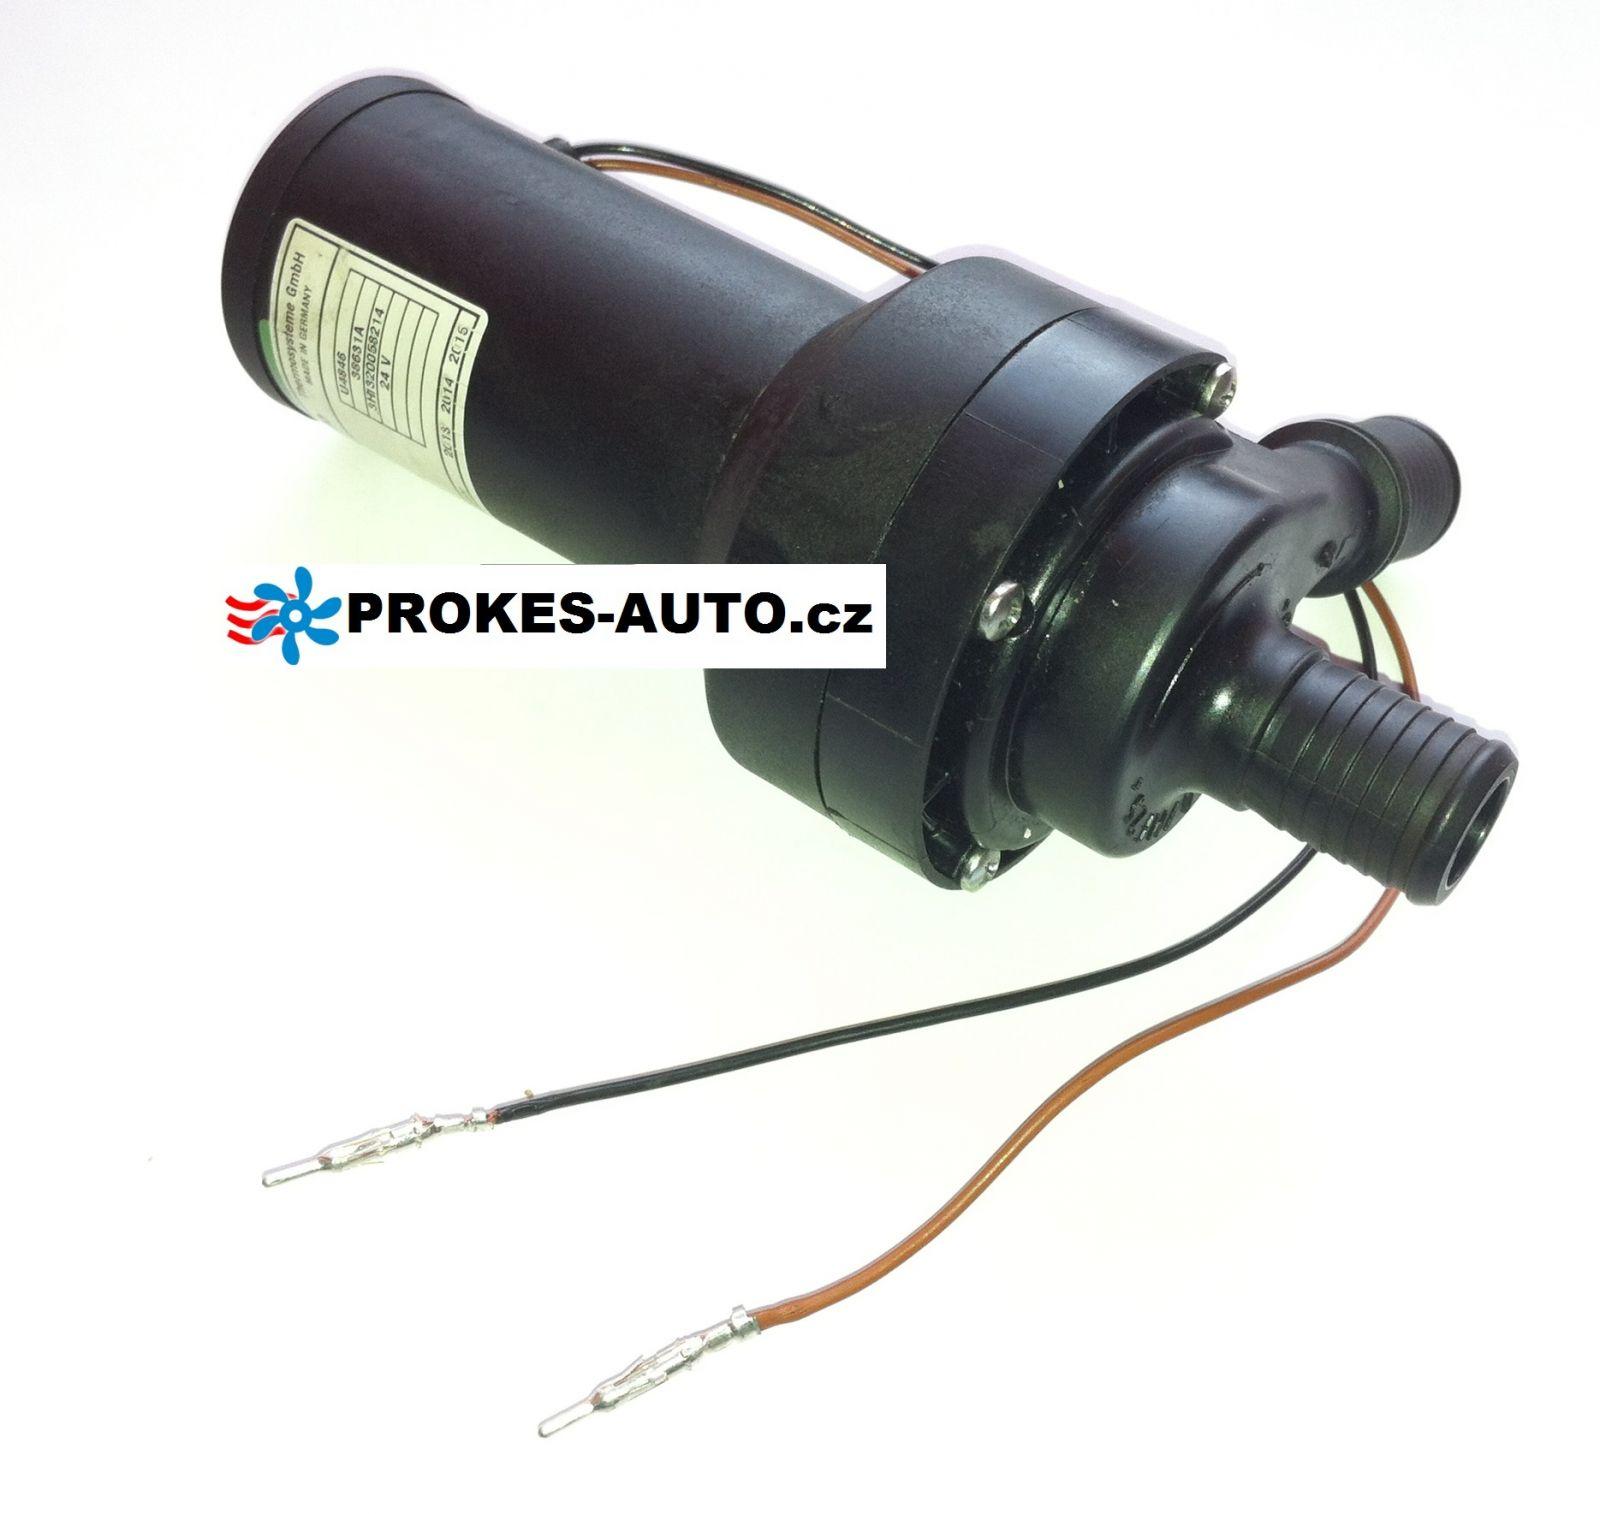 Water circulation pump U4846 24V 82419 / 1322685 / 38631A Webasto